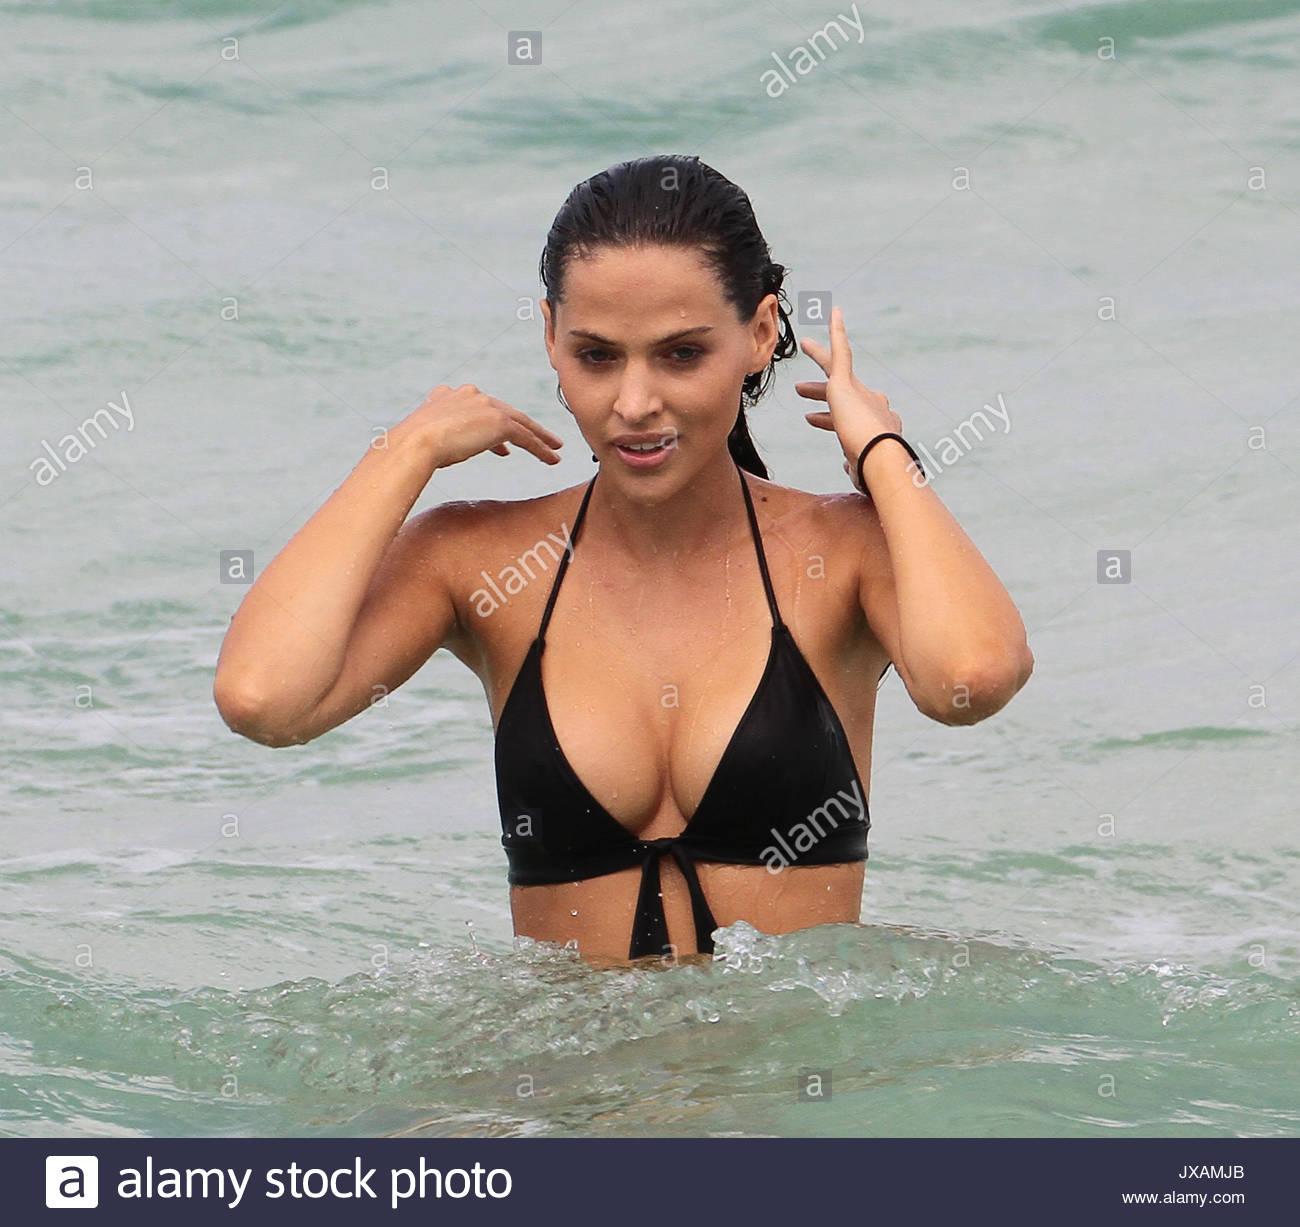 Angelina jolie interracial fakes